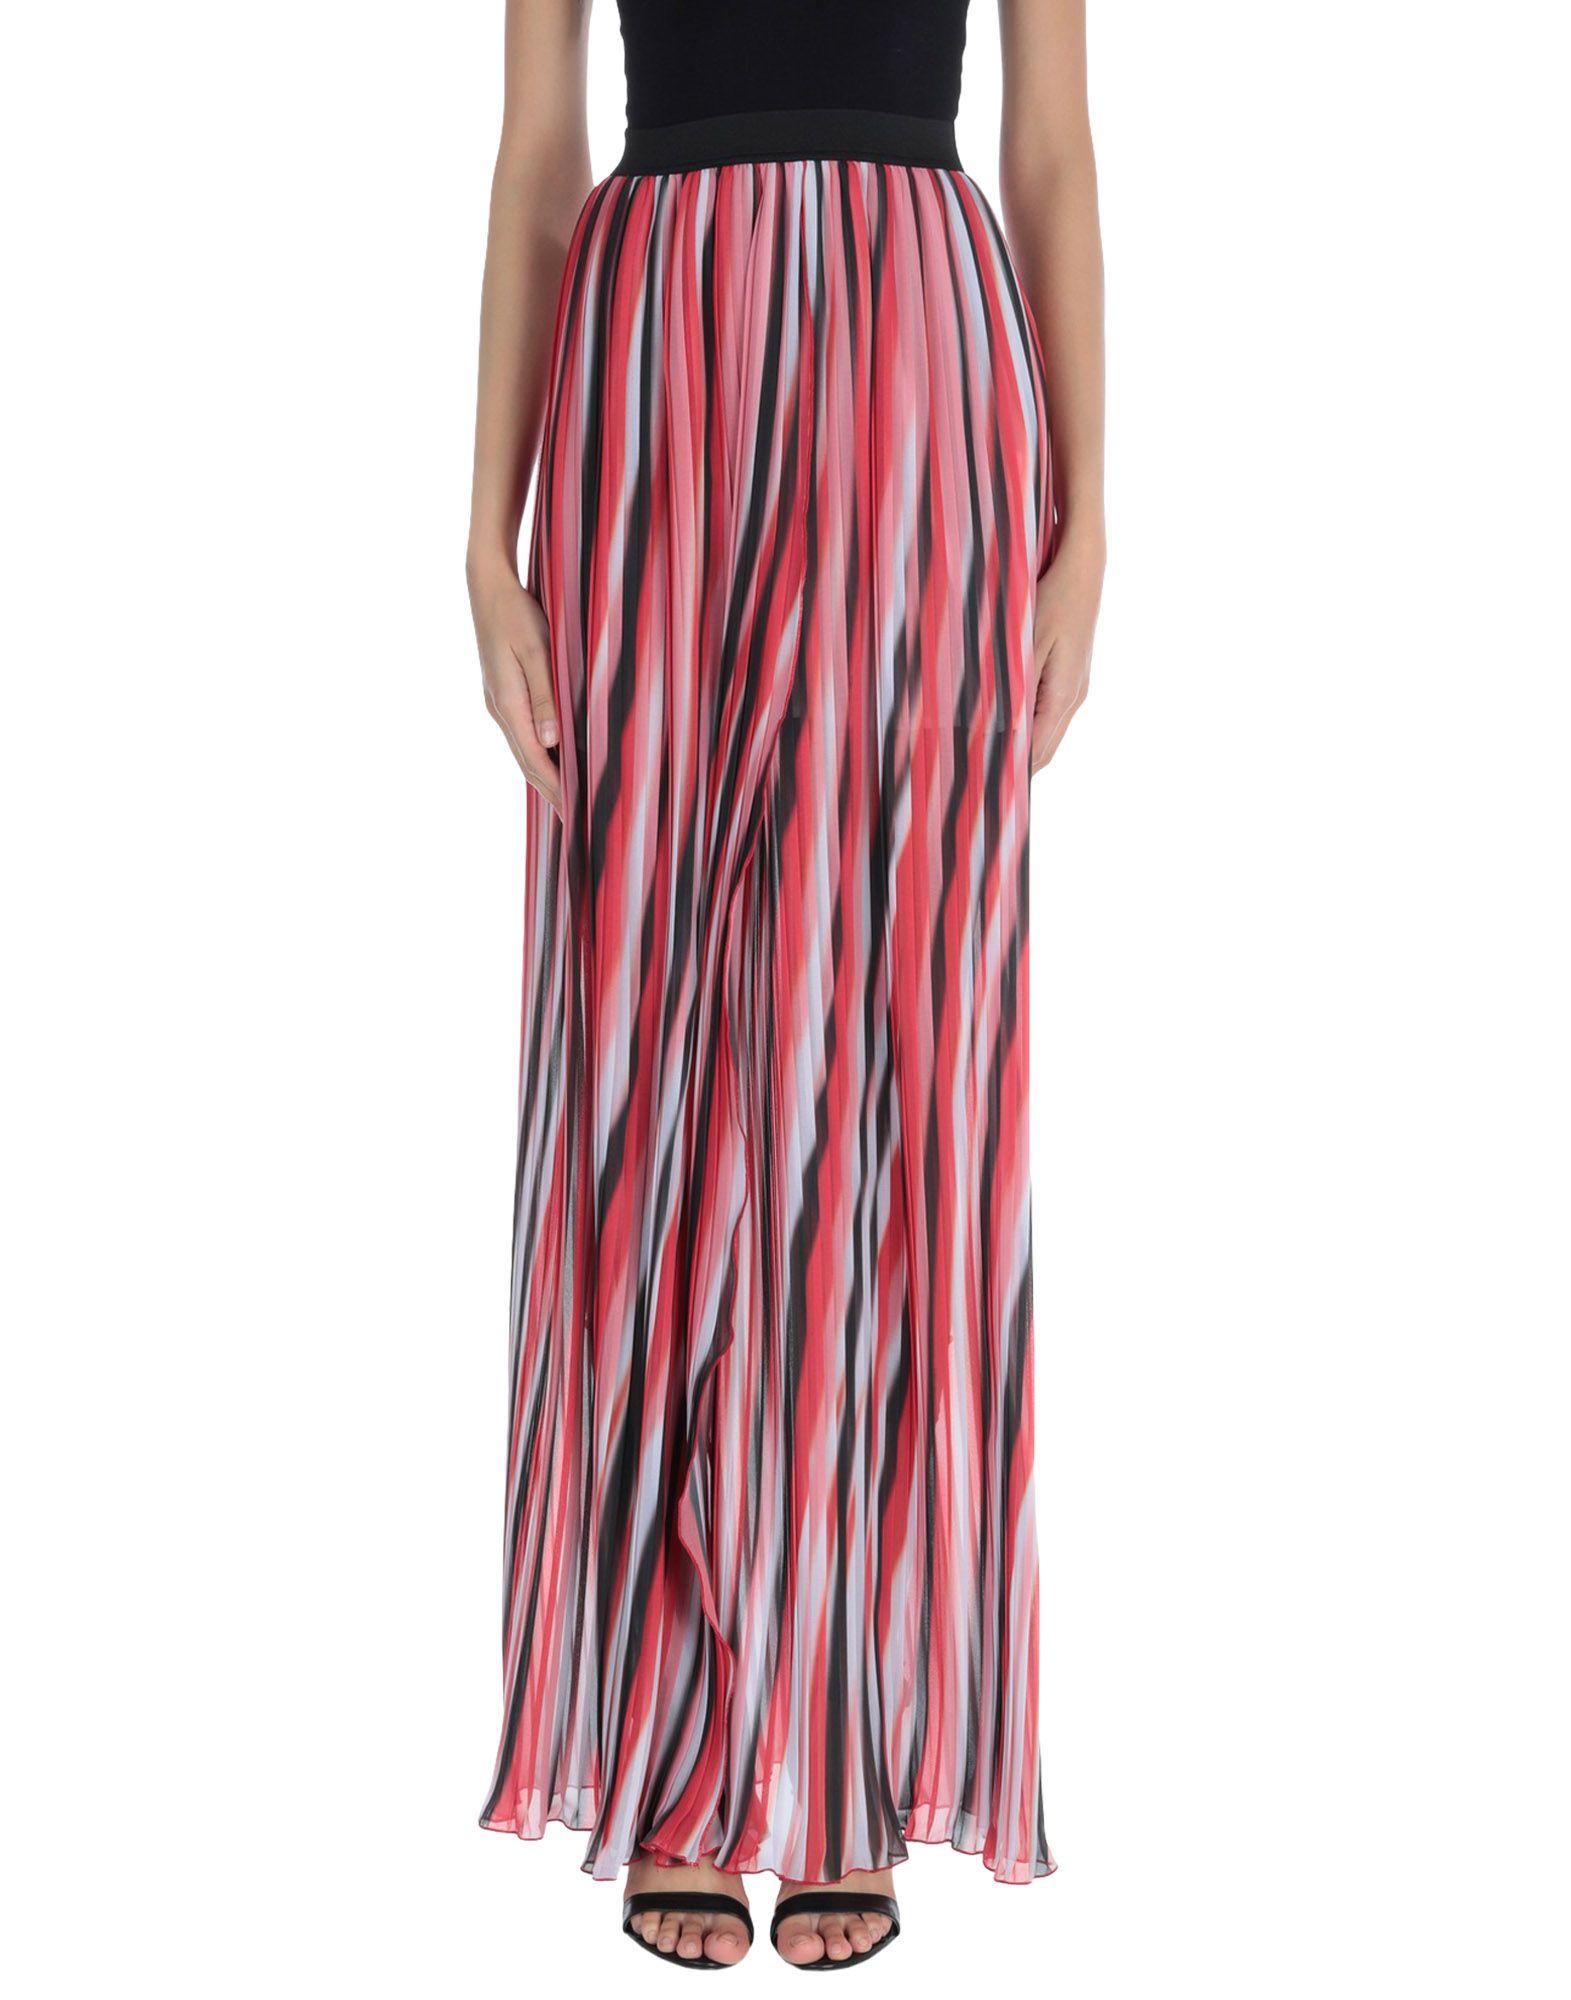 Фото - IT'S A PARTY DRESS Длинная юбка black sexy mesh stitching swing party dress